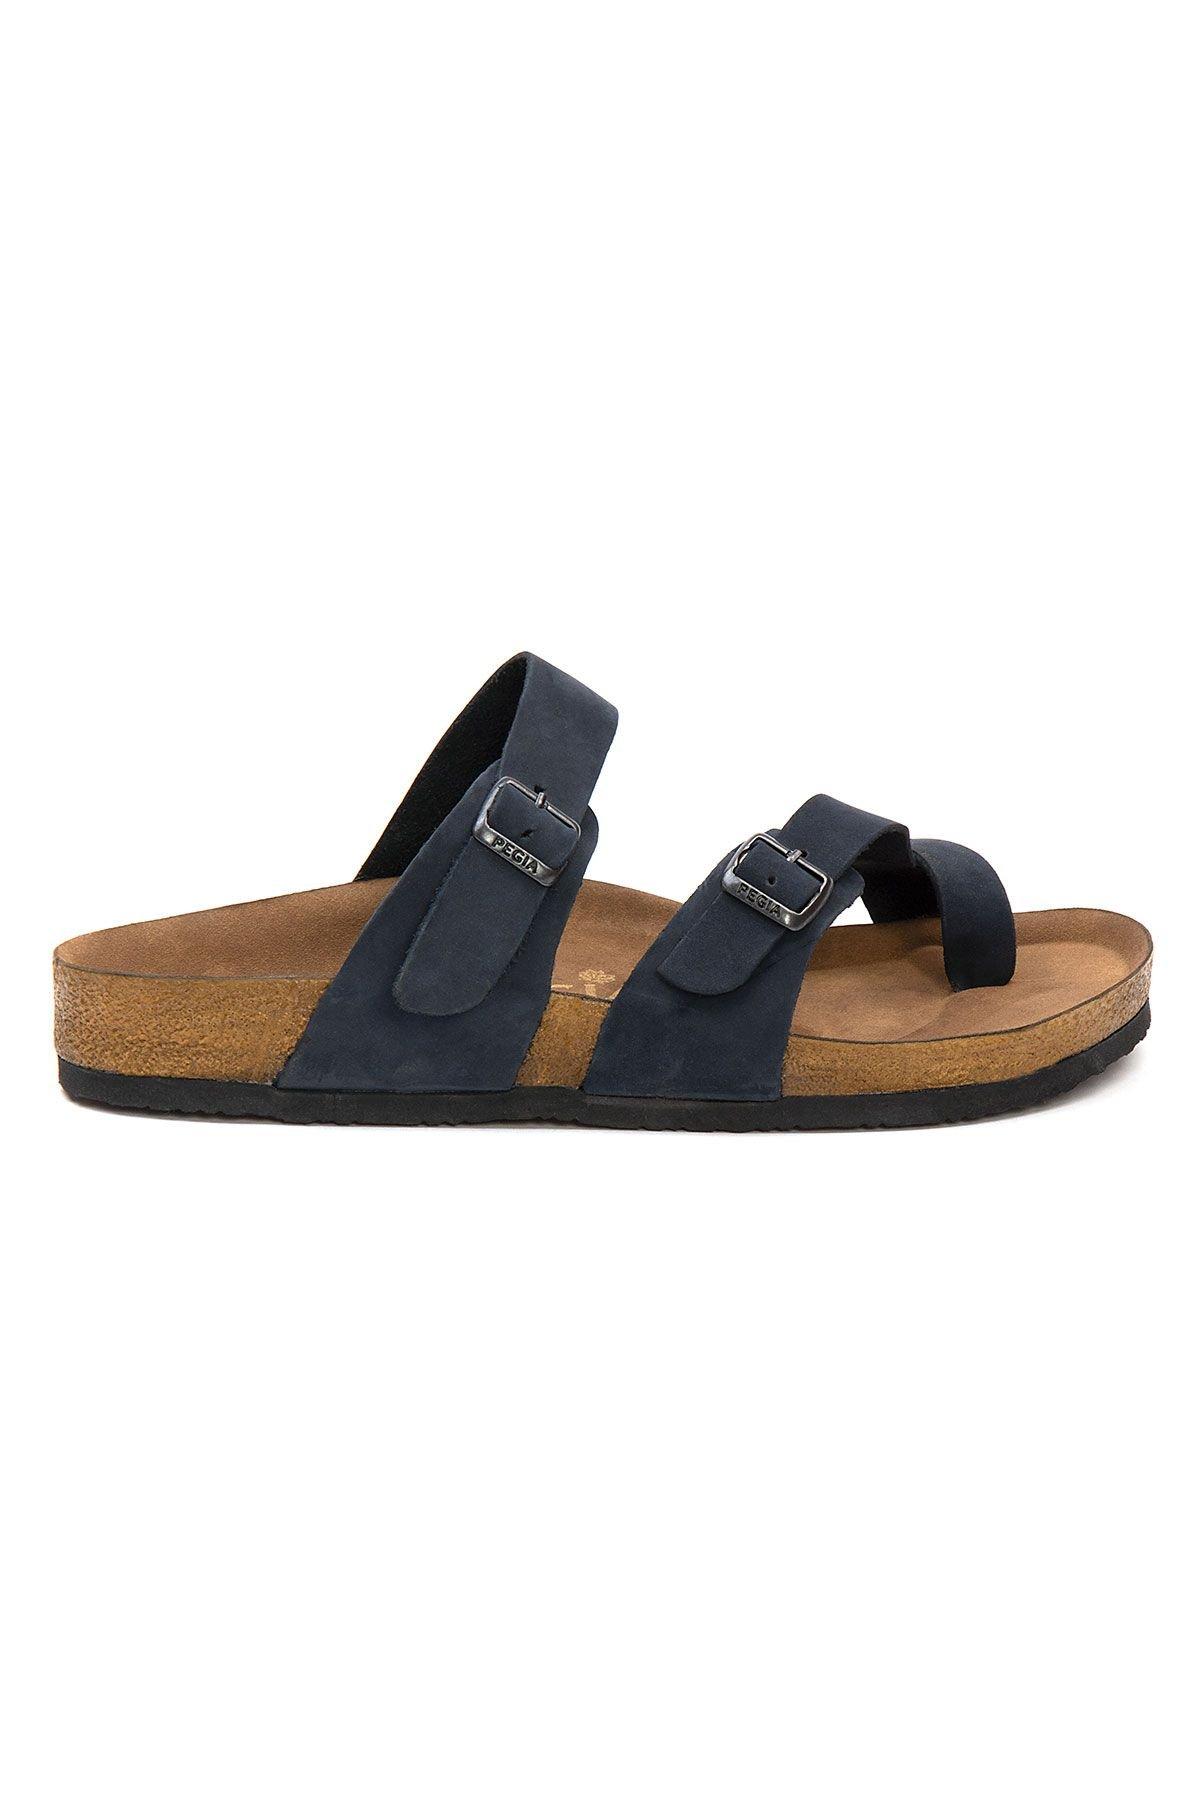 Pegia Genuine Leather Men's Slippers 215022 Navy blue